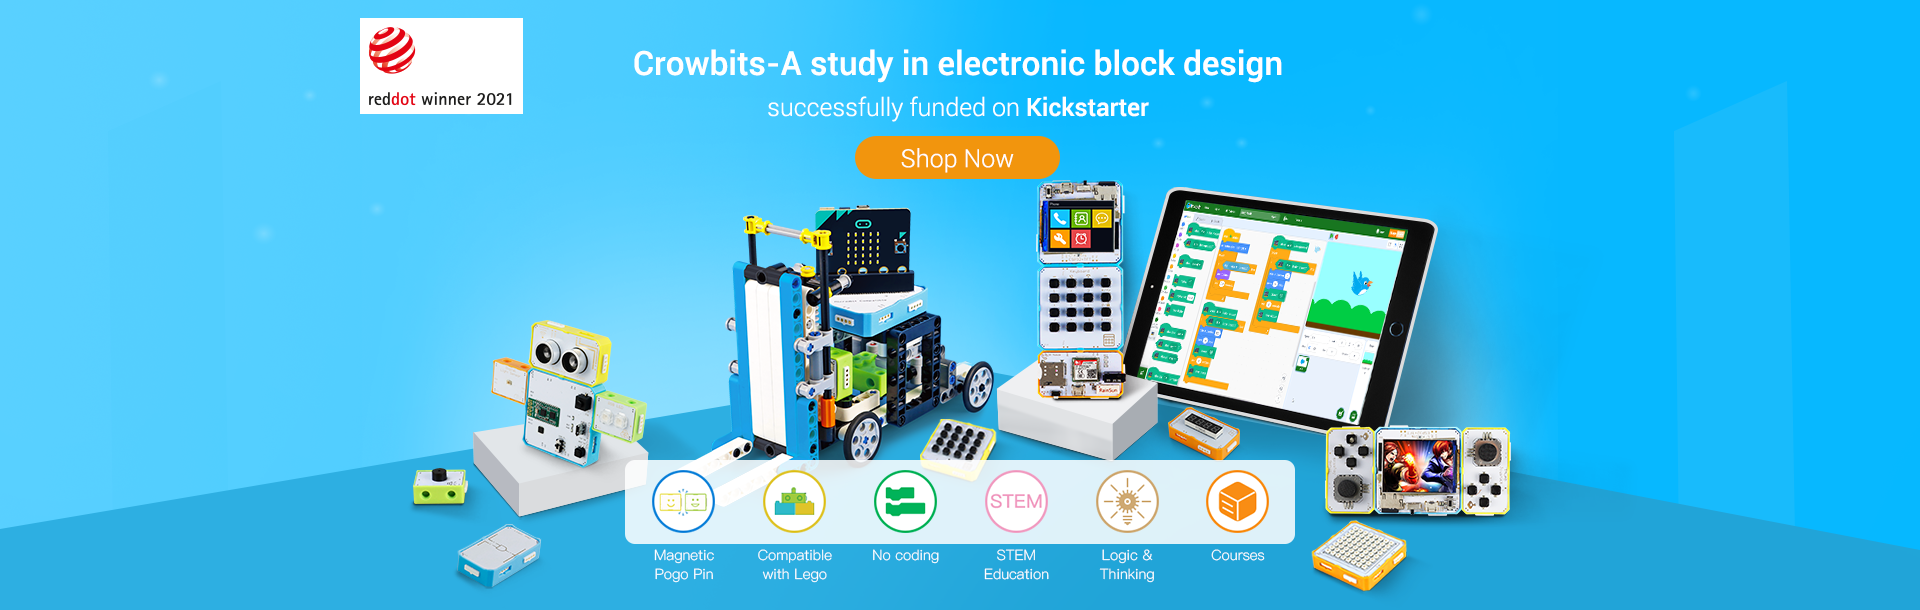 https://www.elecrow.com/crowbits-kit/kits.html